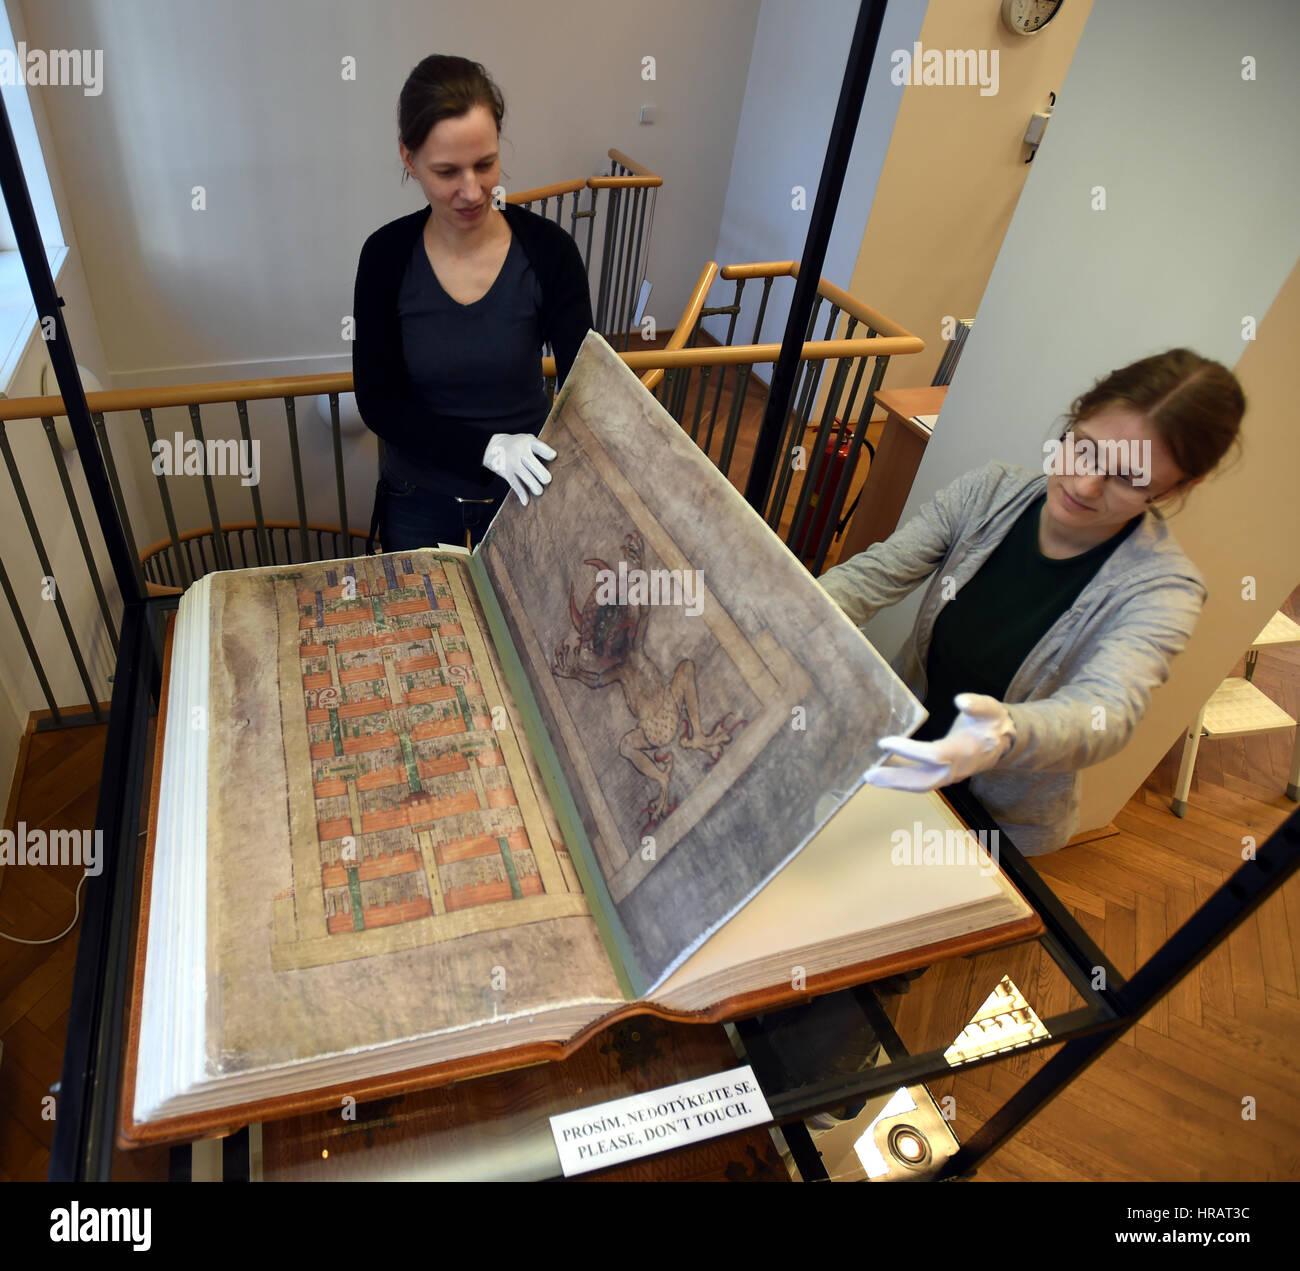 Librarians Ludmila Netusilova, left, and Martina Vodakova adjust